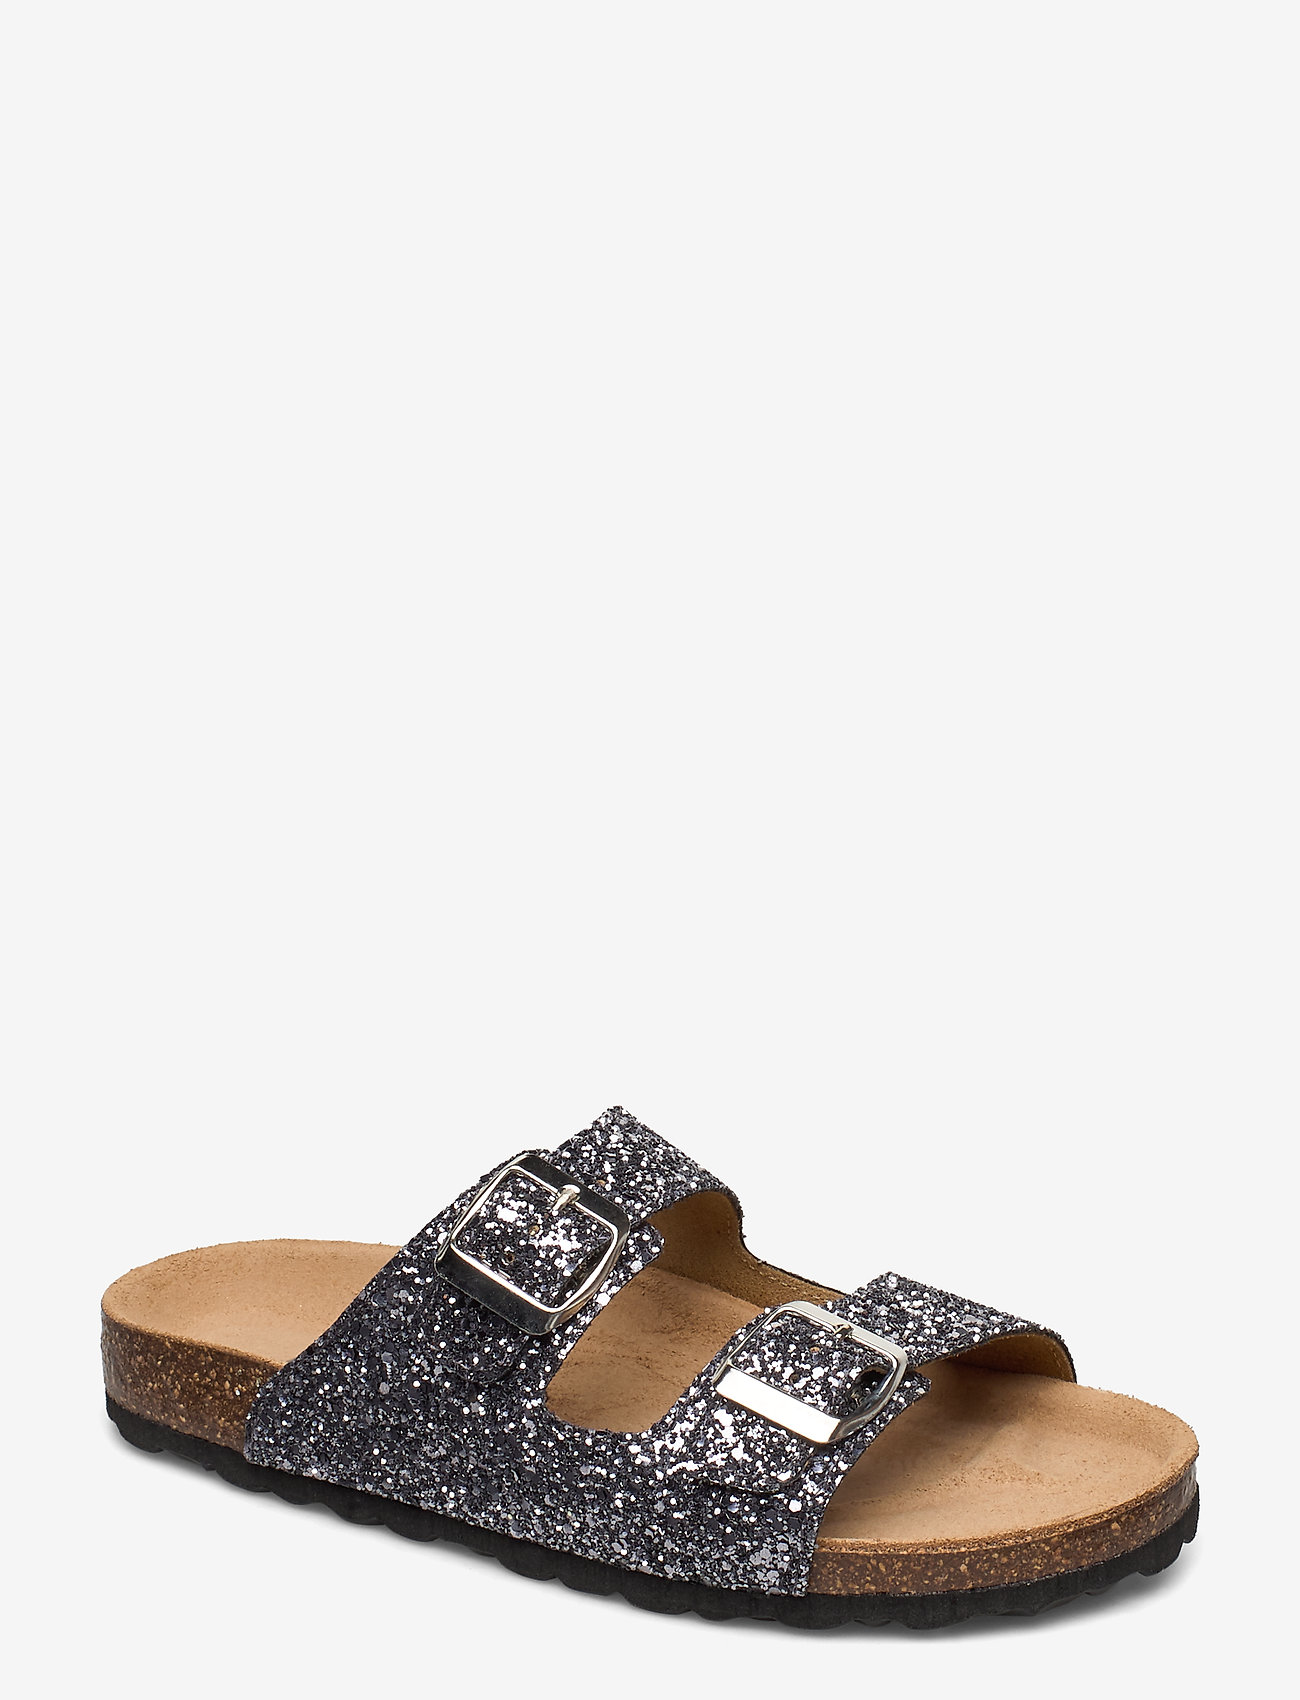 Sofie Schnoor - Sandal - sandales - antique silver - 0